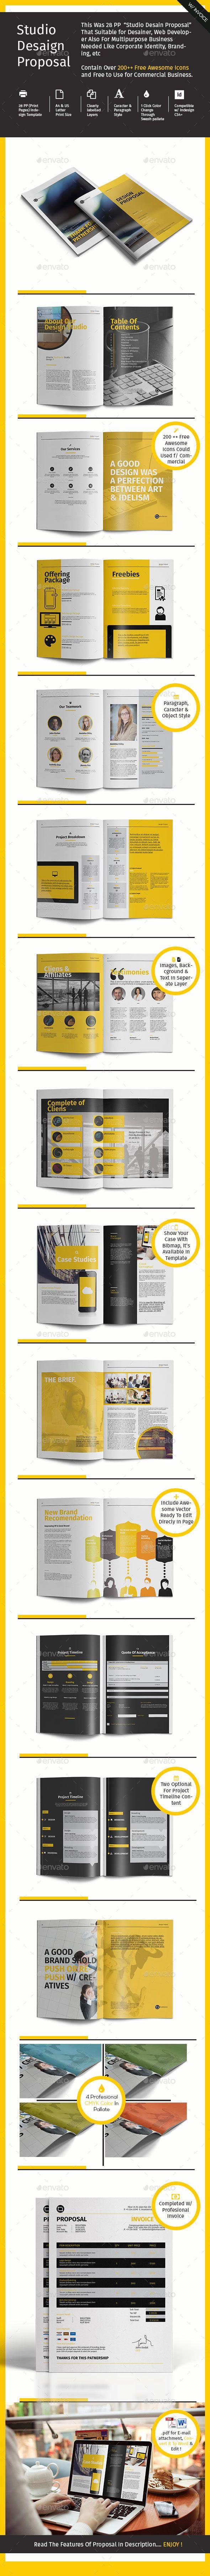 Studio Design Proposal Template PSD | Buy and Download: http://graphicriver.net/item/studio-design-proposal/9522921?ref=ksioks